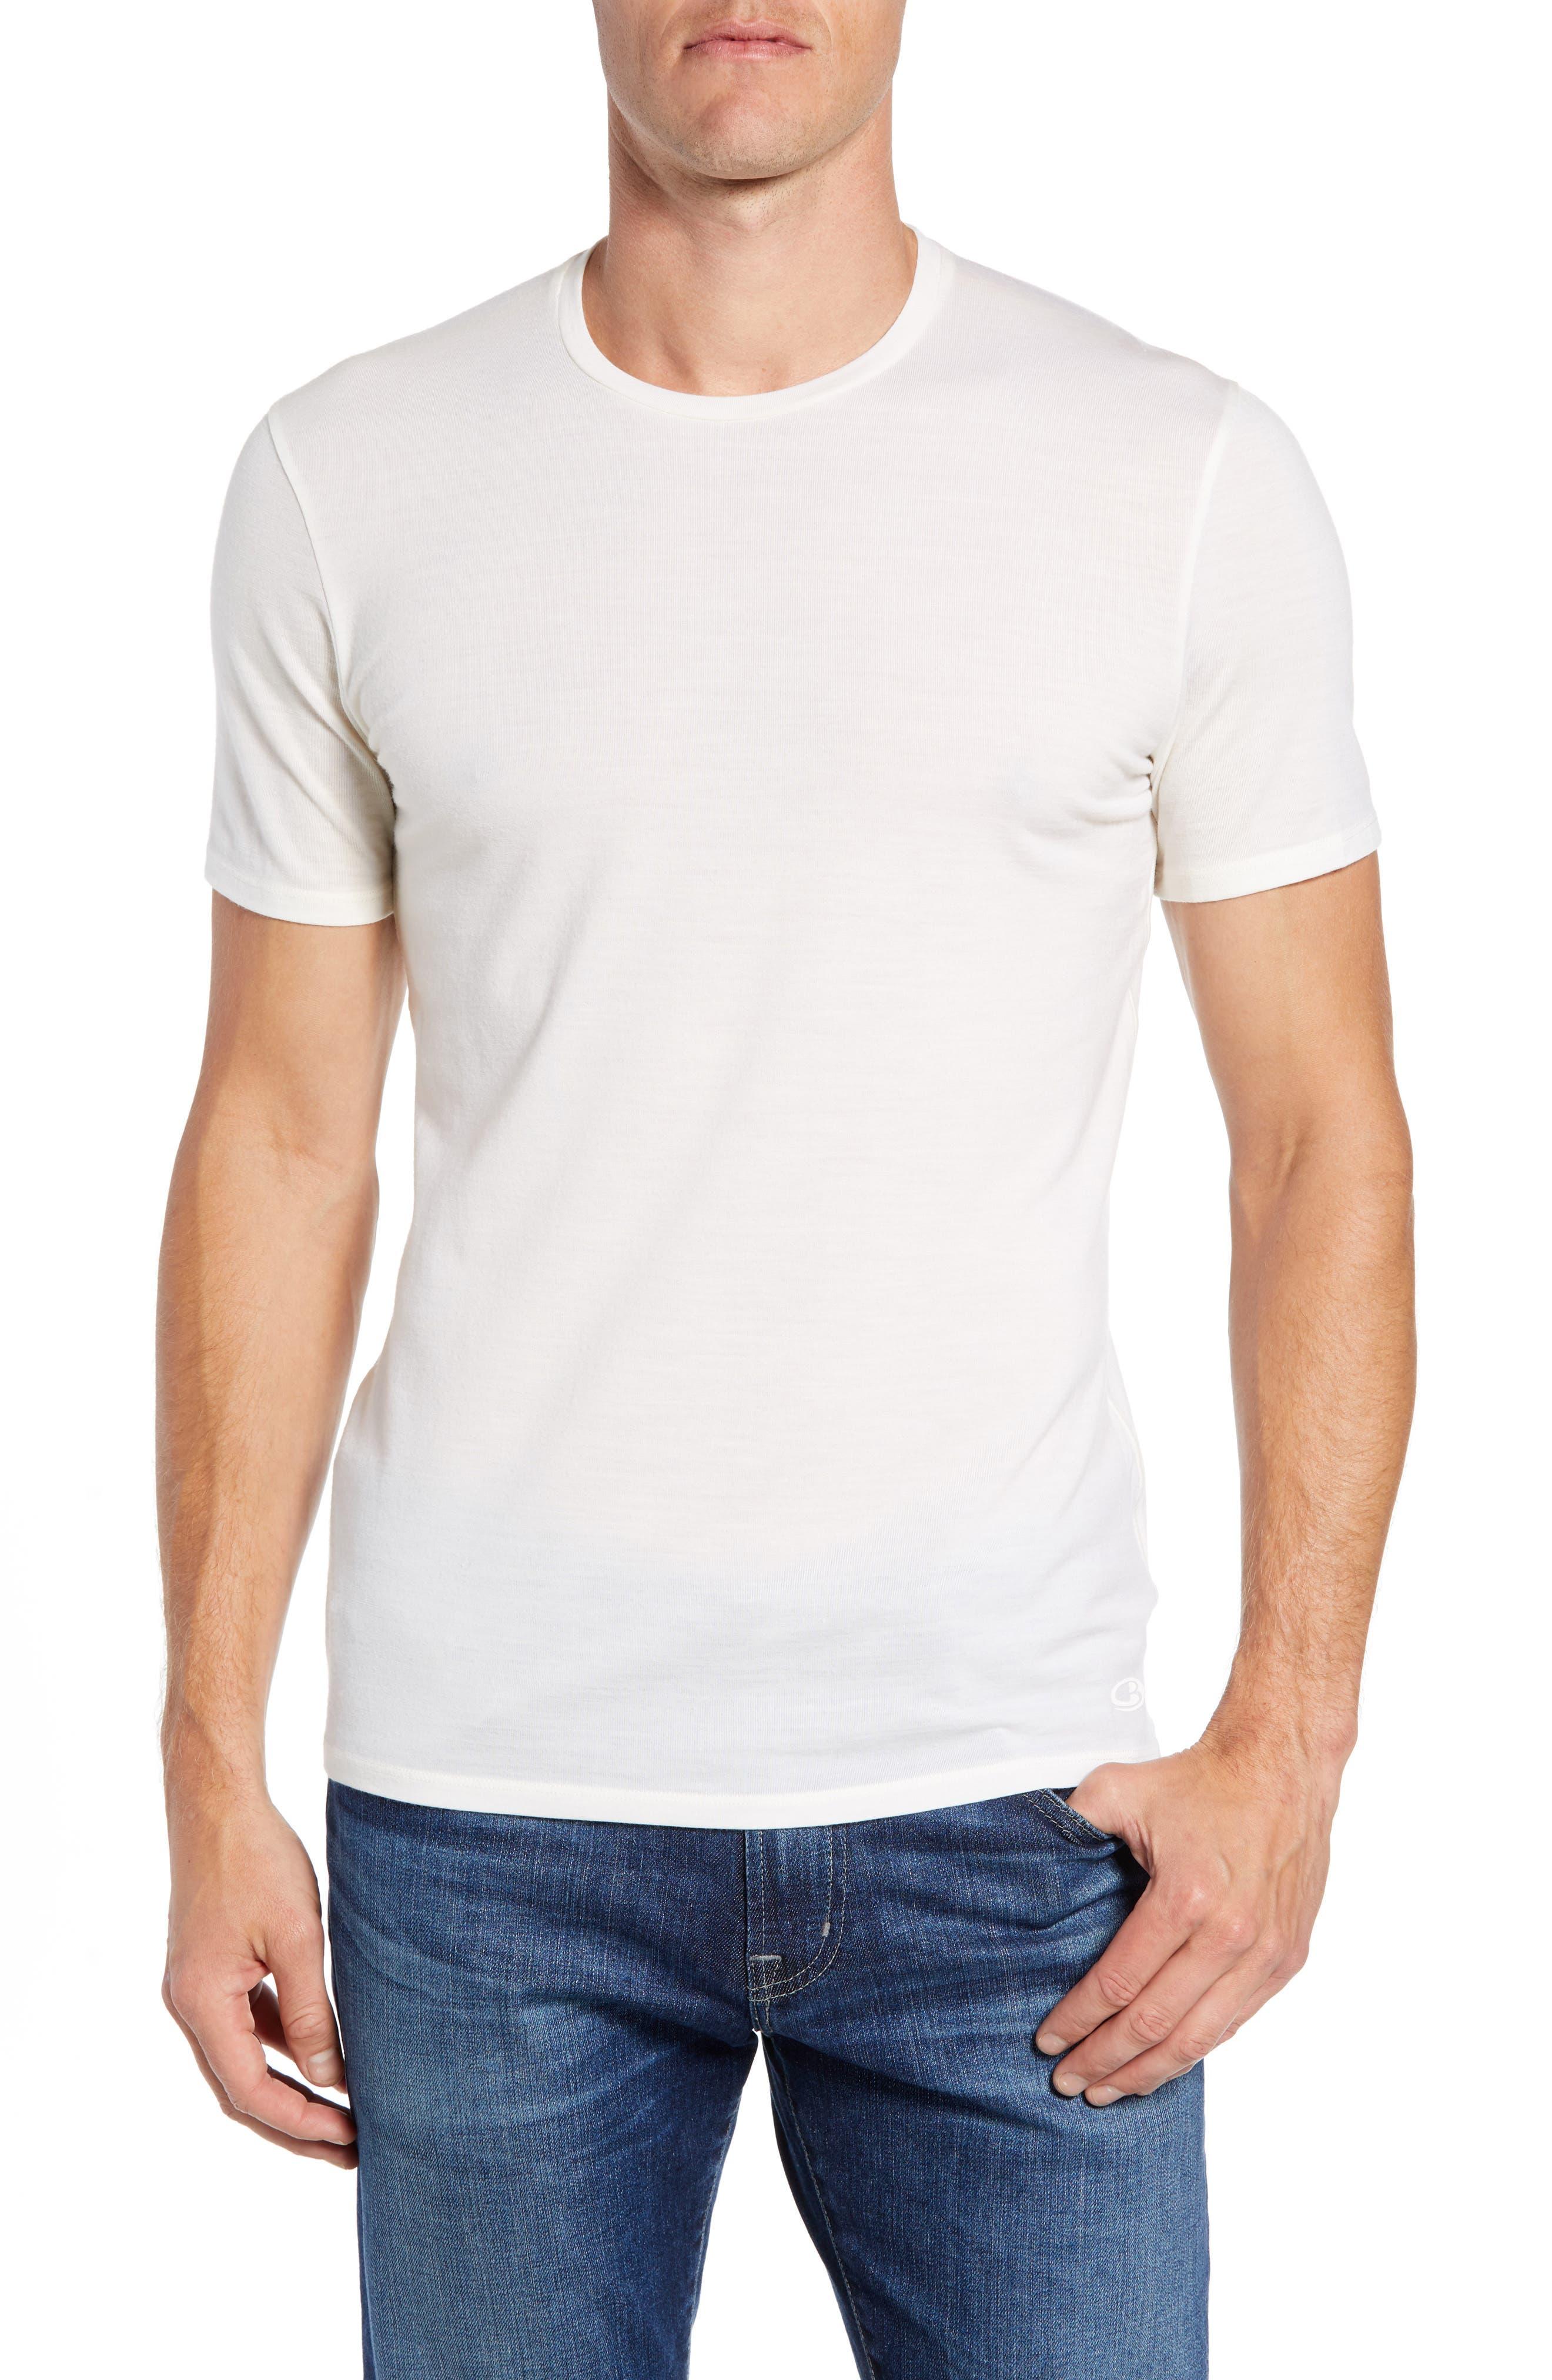 Anatomica Short Sleeve Crewneck T-Shirt